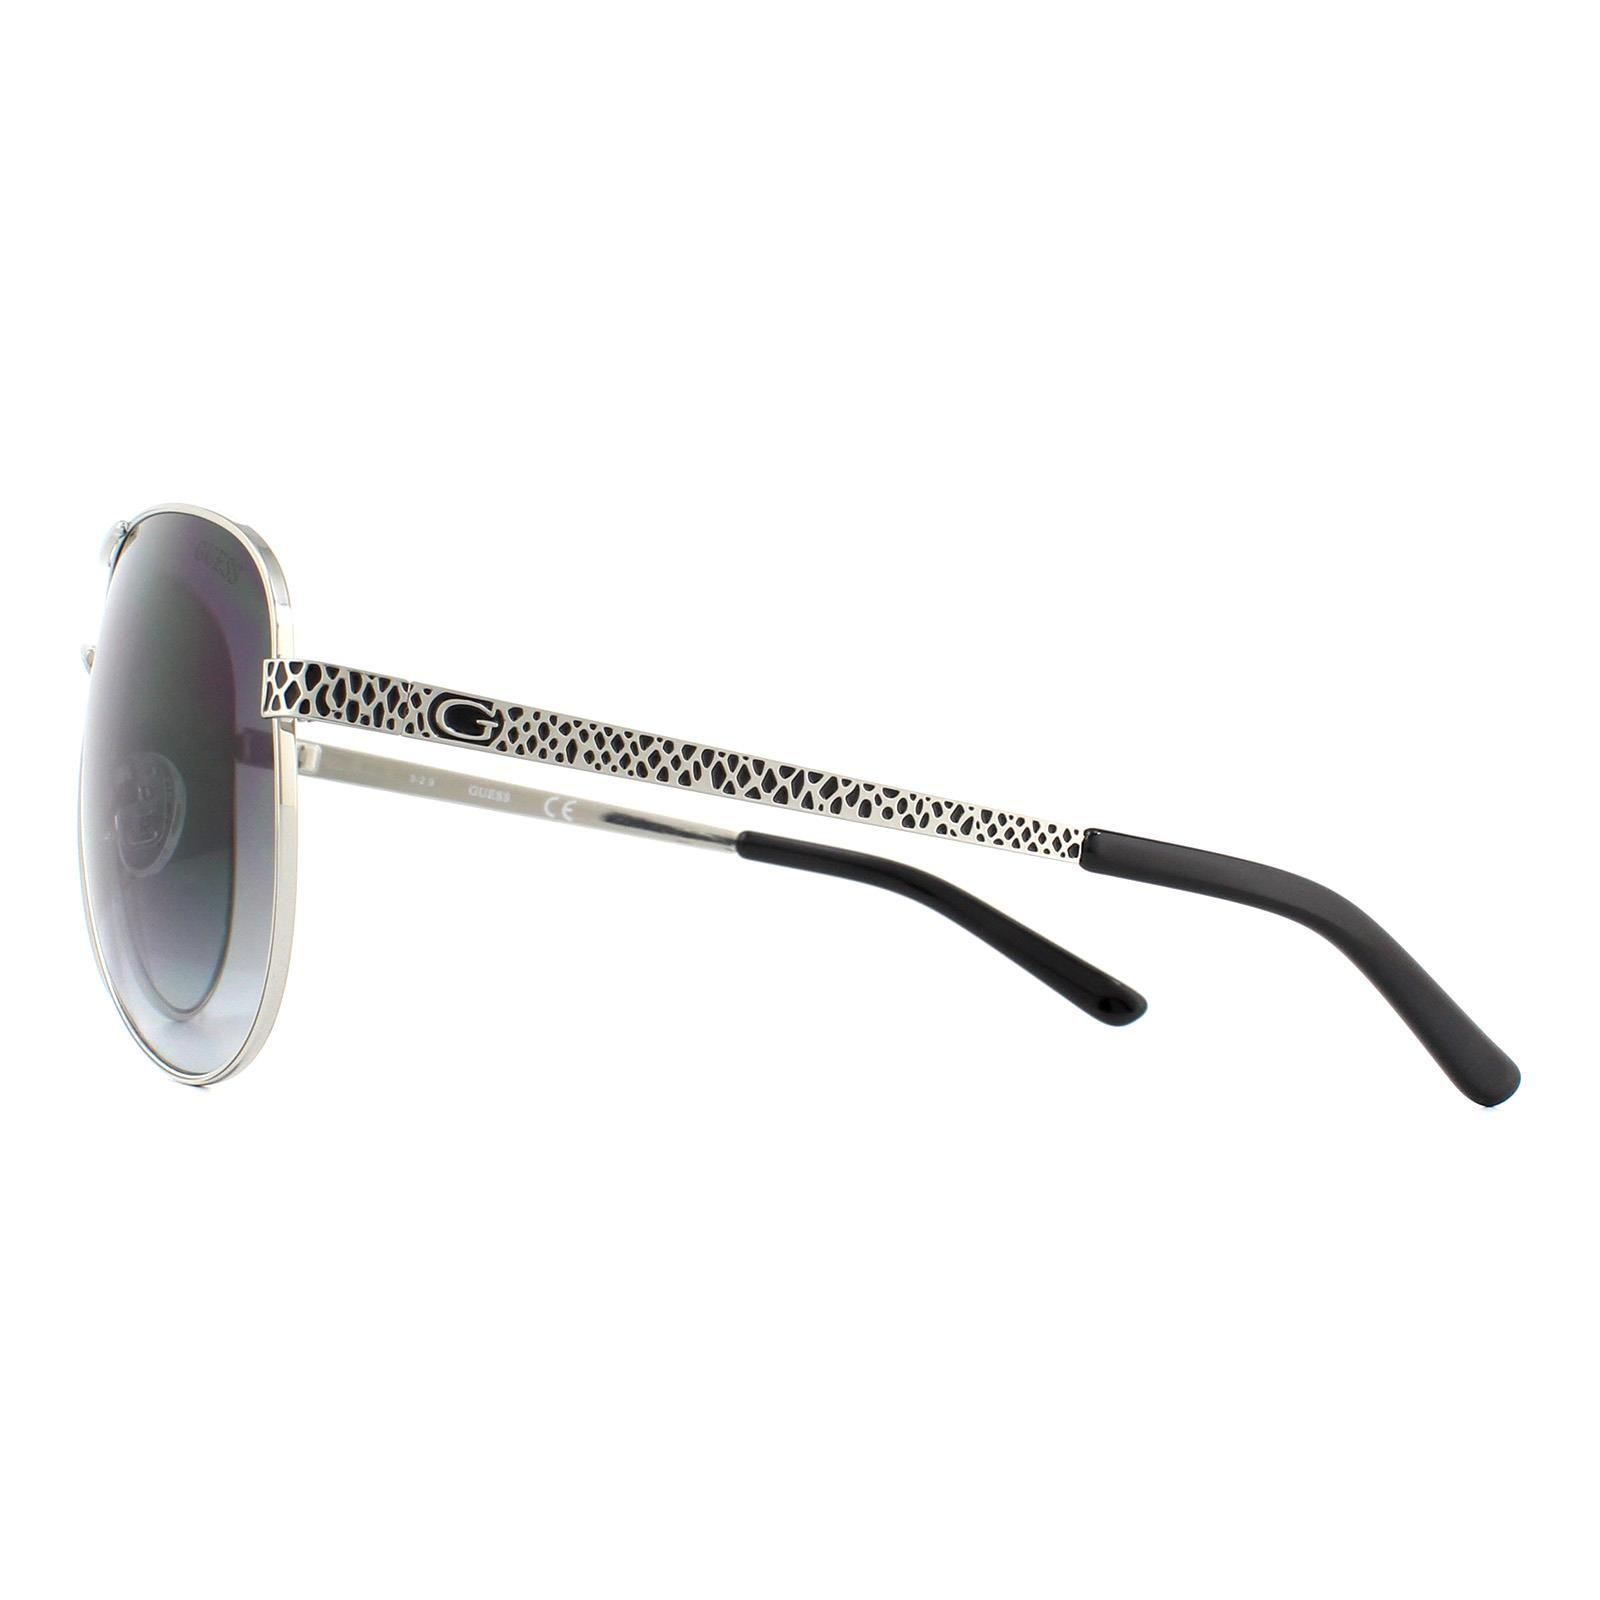 Guess Sunglasses GU7370 A87 Silver Grey Gradient